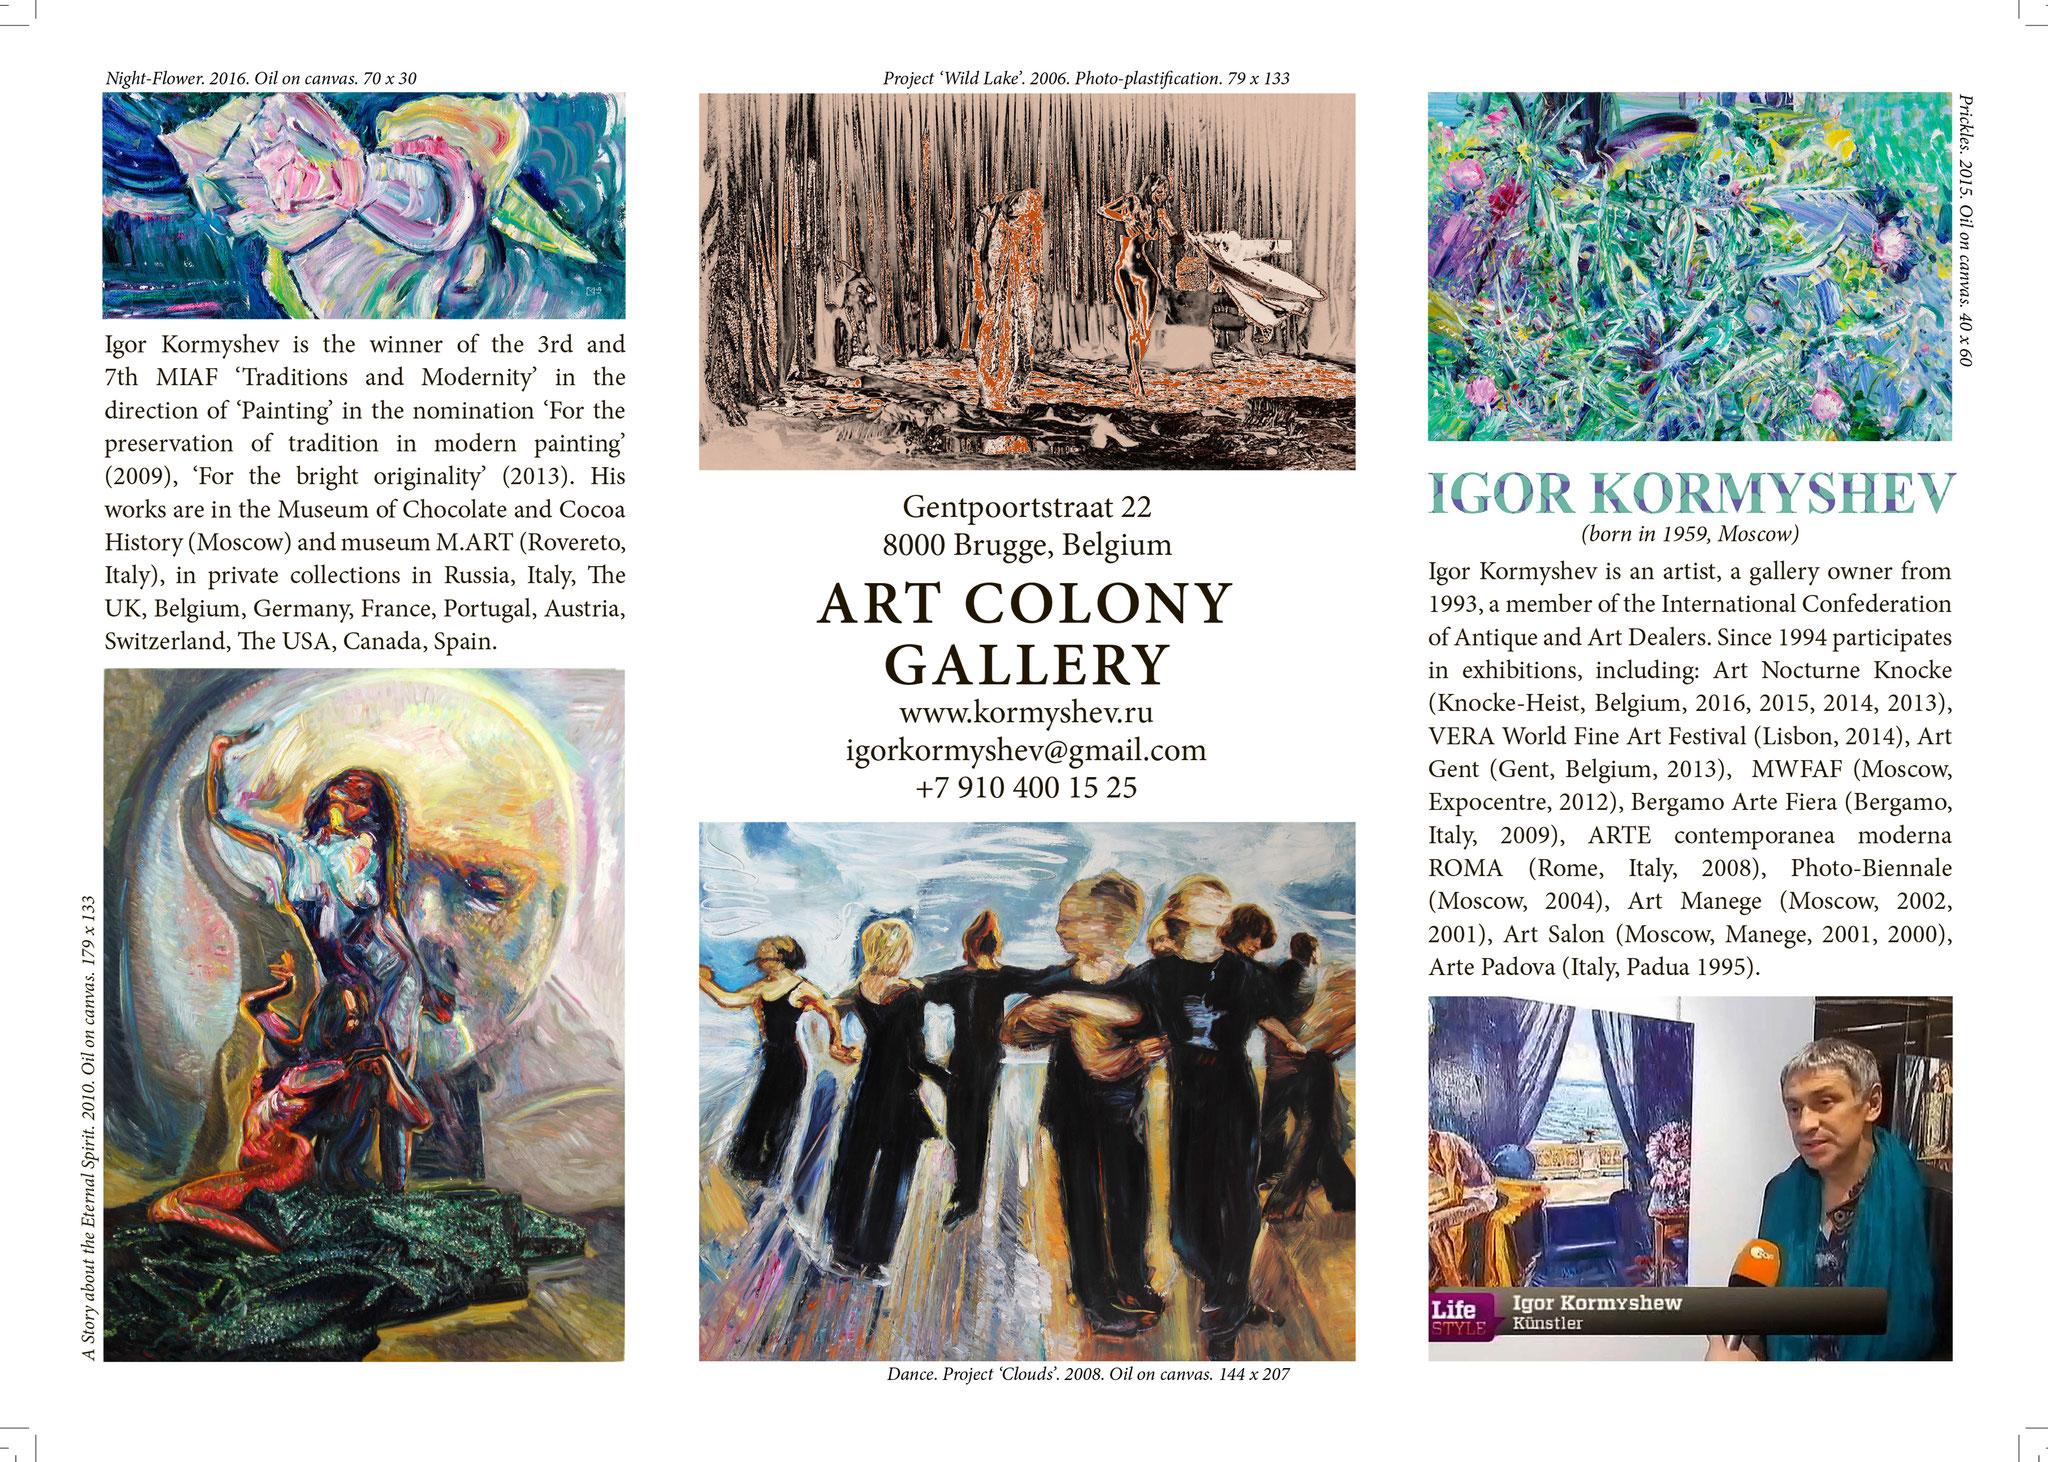 The exhibition booklet. Design by Alina Guseynova